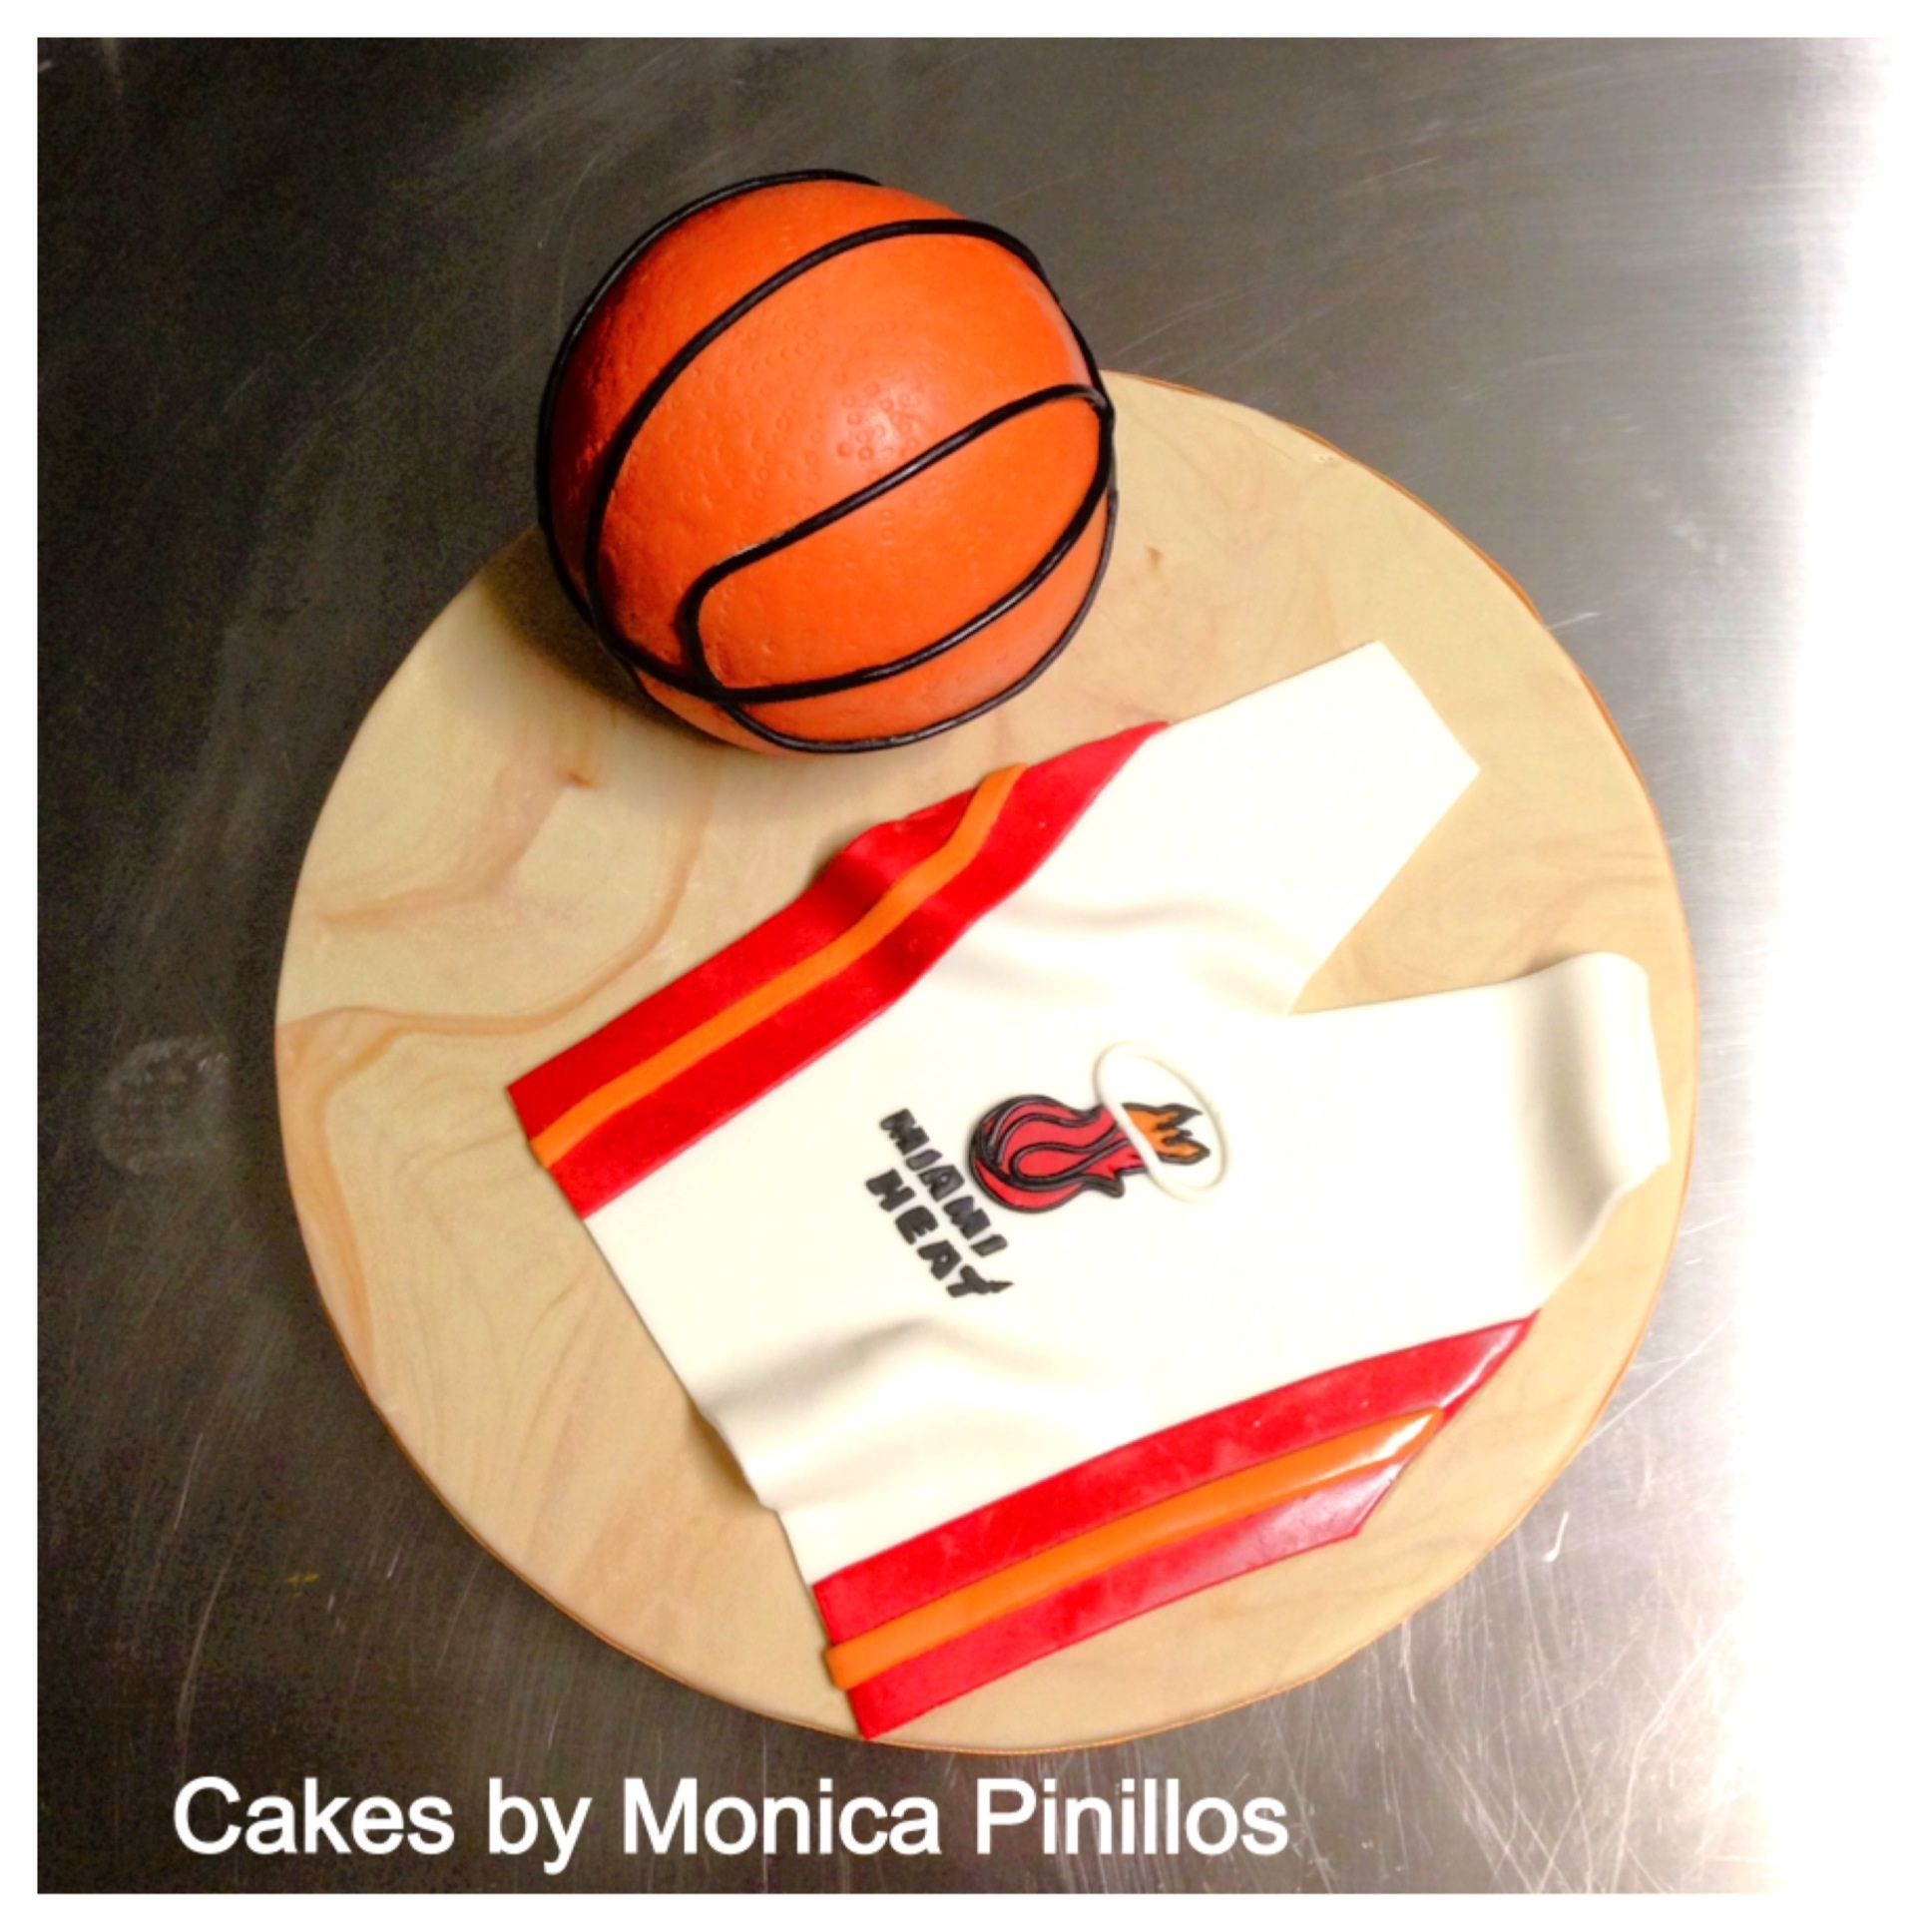 Miamiheatcake By Monicacpinillos Basketball Cake Sport Cakes 3d Cakes Basketball Cake Sport Cakes Cake